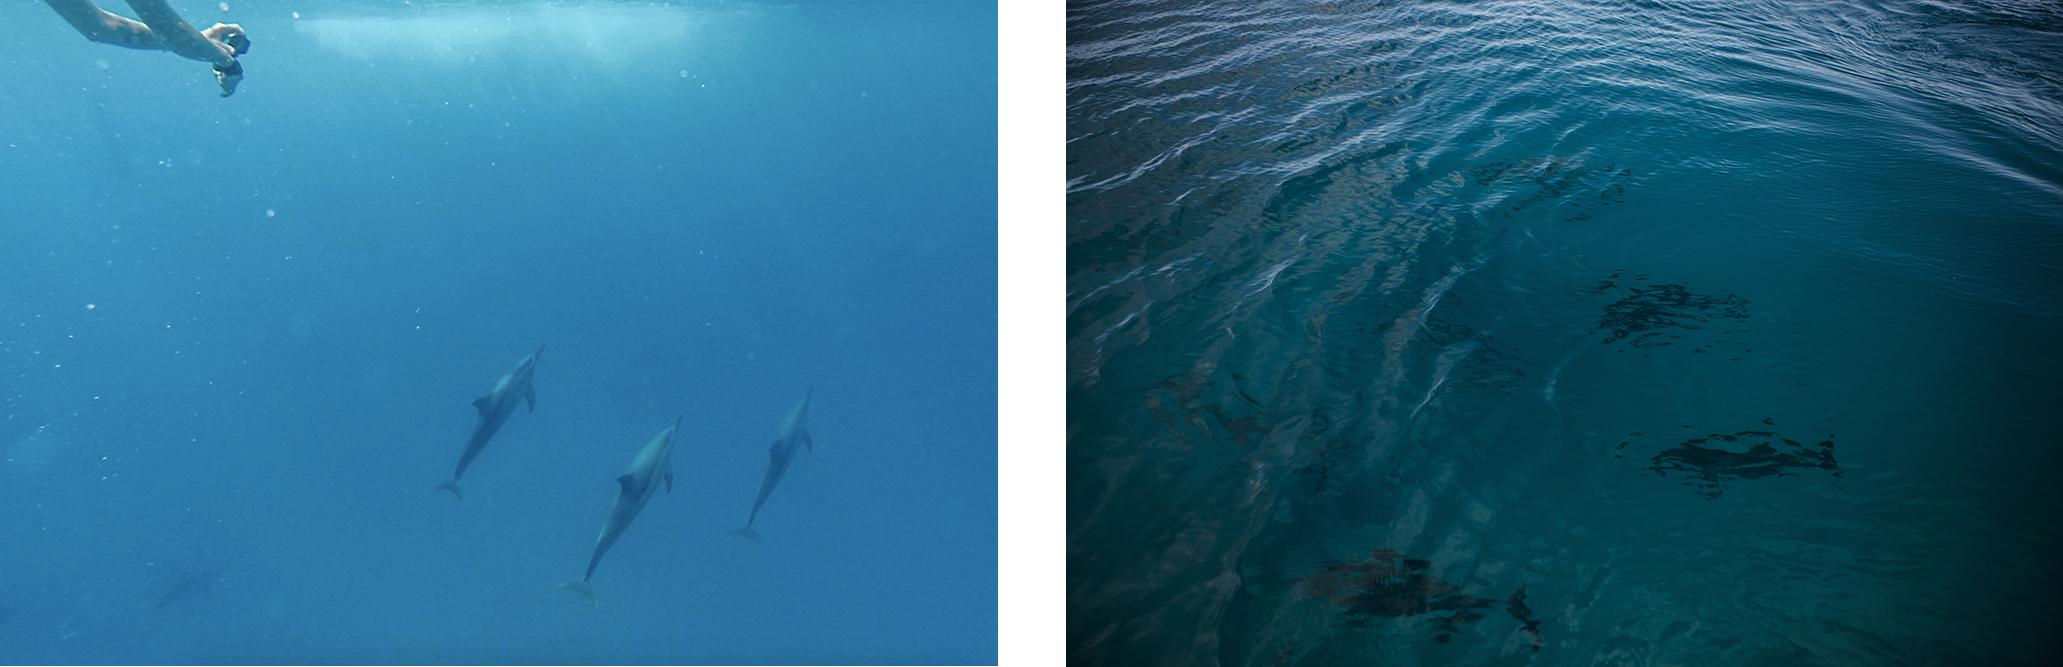 nager avec les dauphins ocean indien